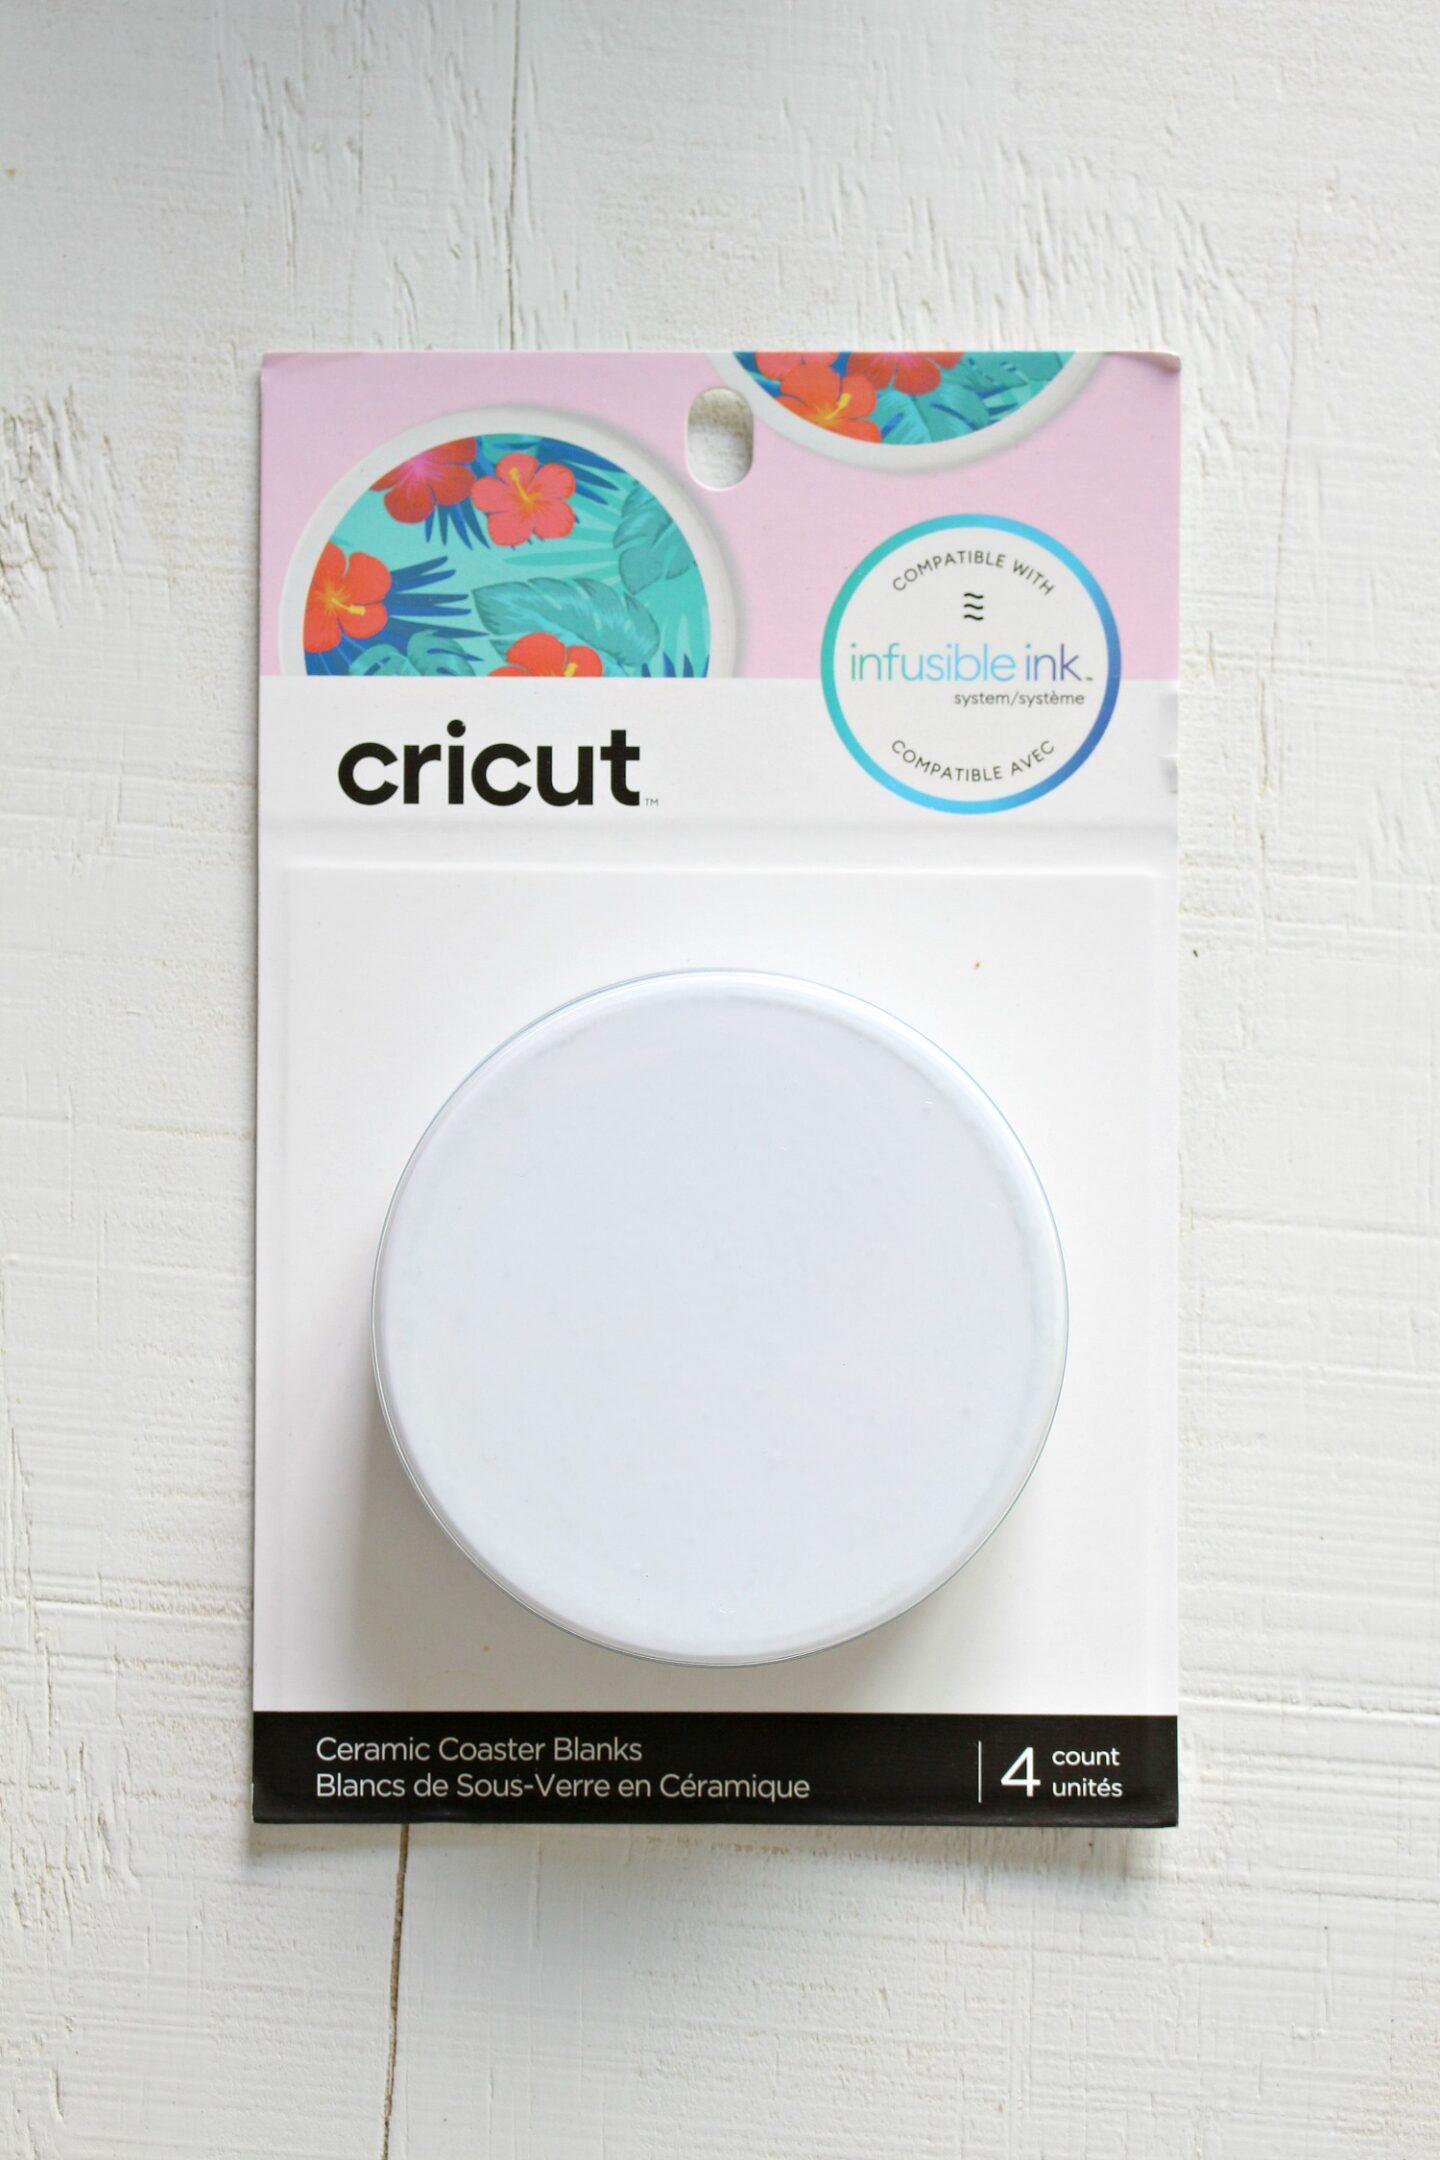 Cricut Ceramic Coaster Blanks Quality